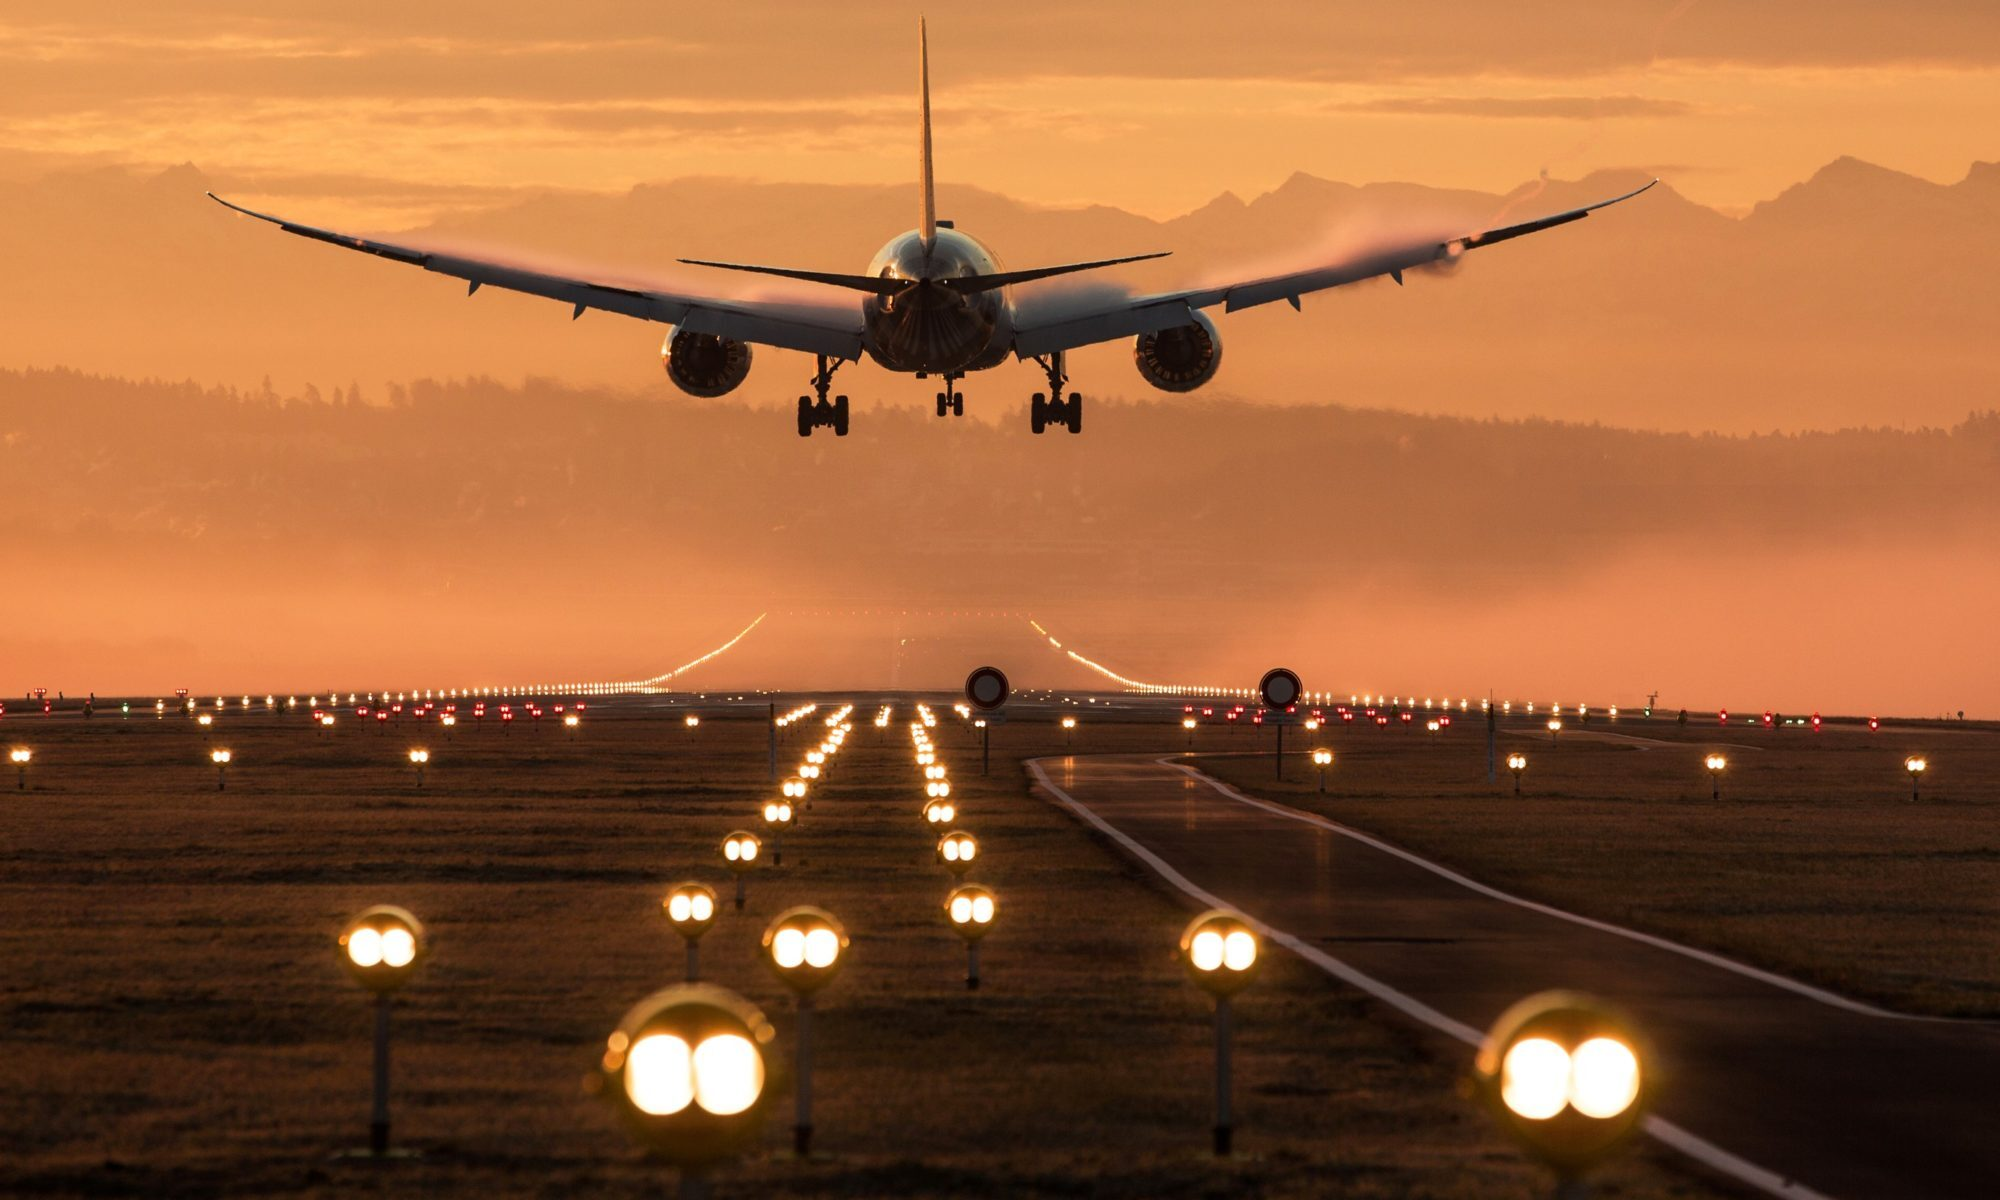 Фото пассажирского самолета идет на посадку